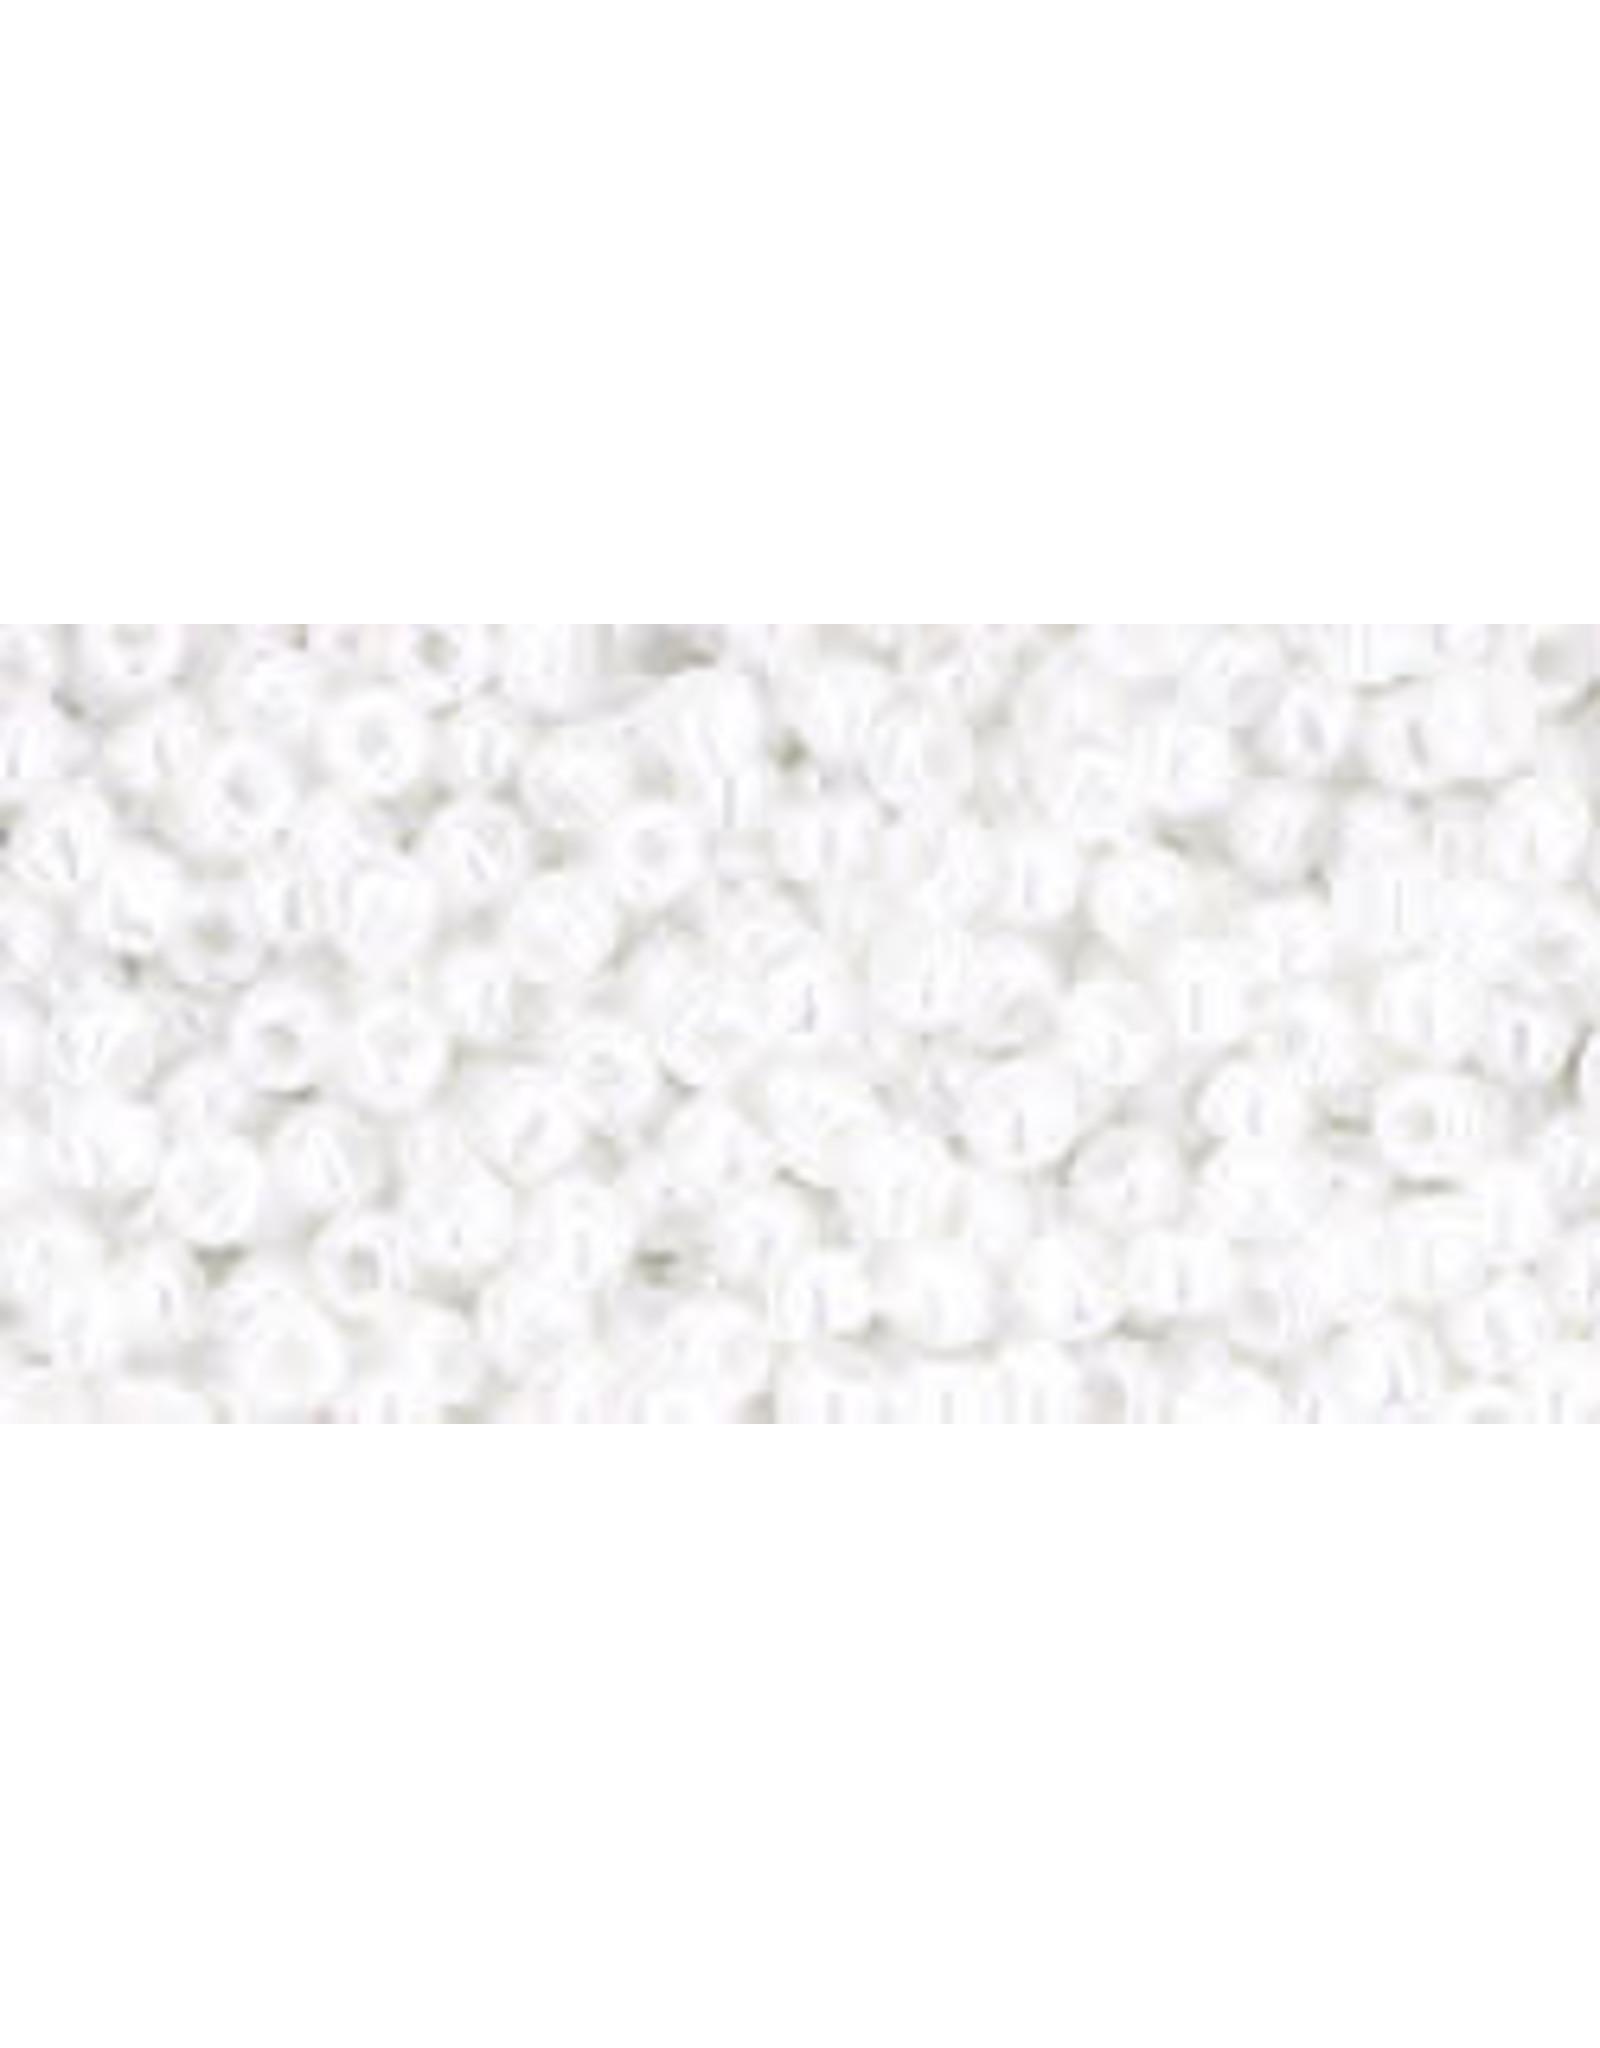 Toho 121B 11  Round 40g Opaque  White Lustre